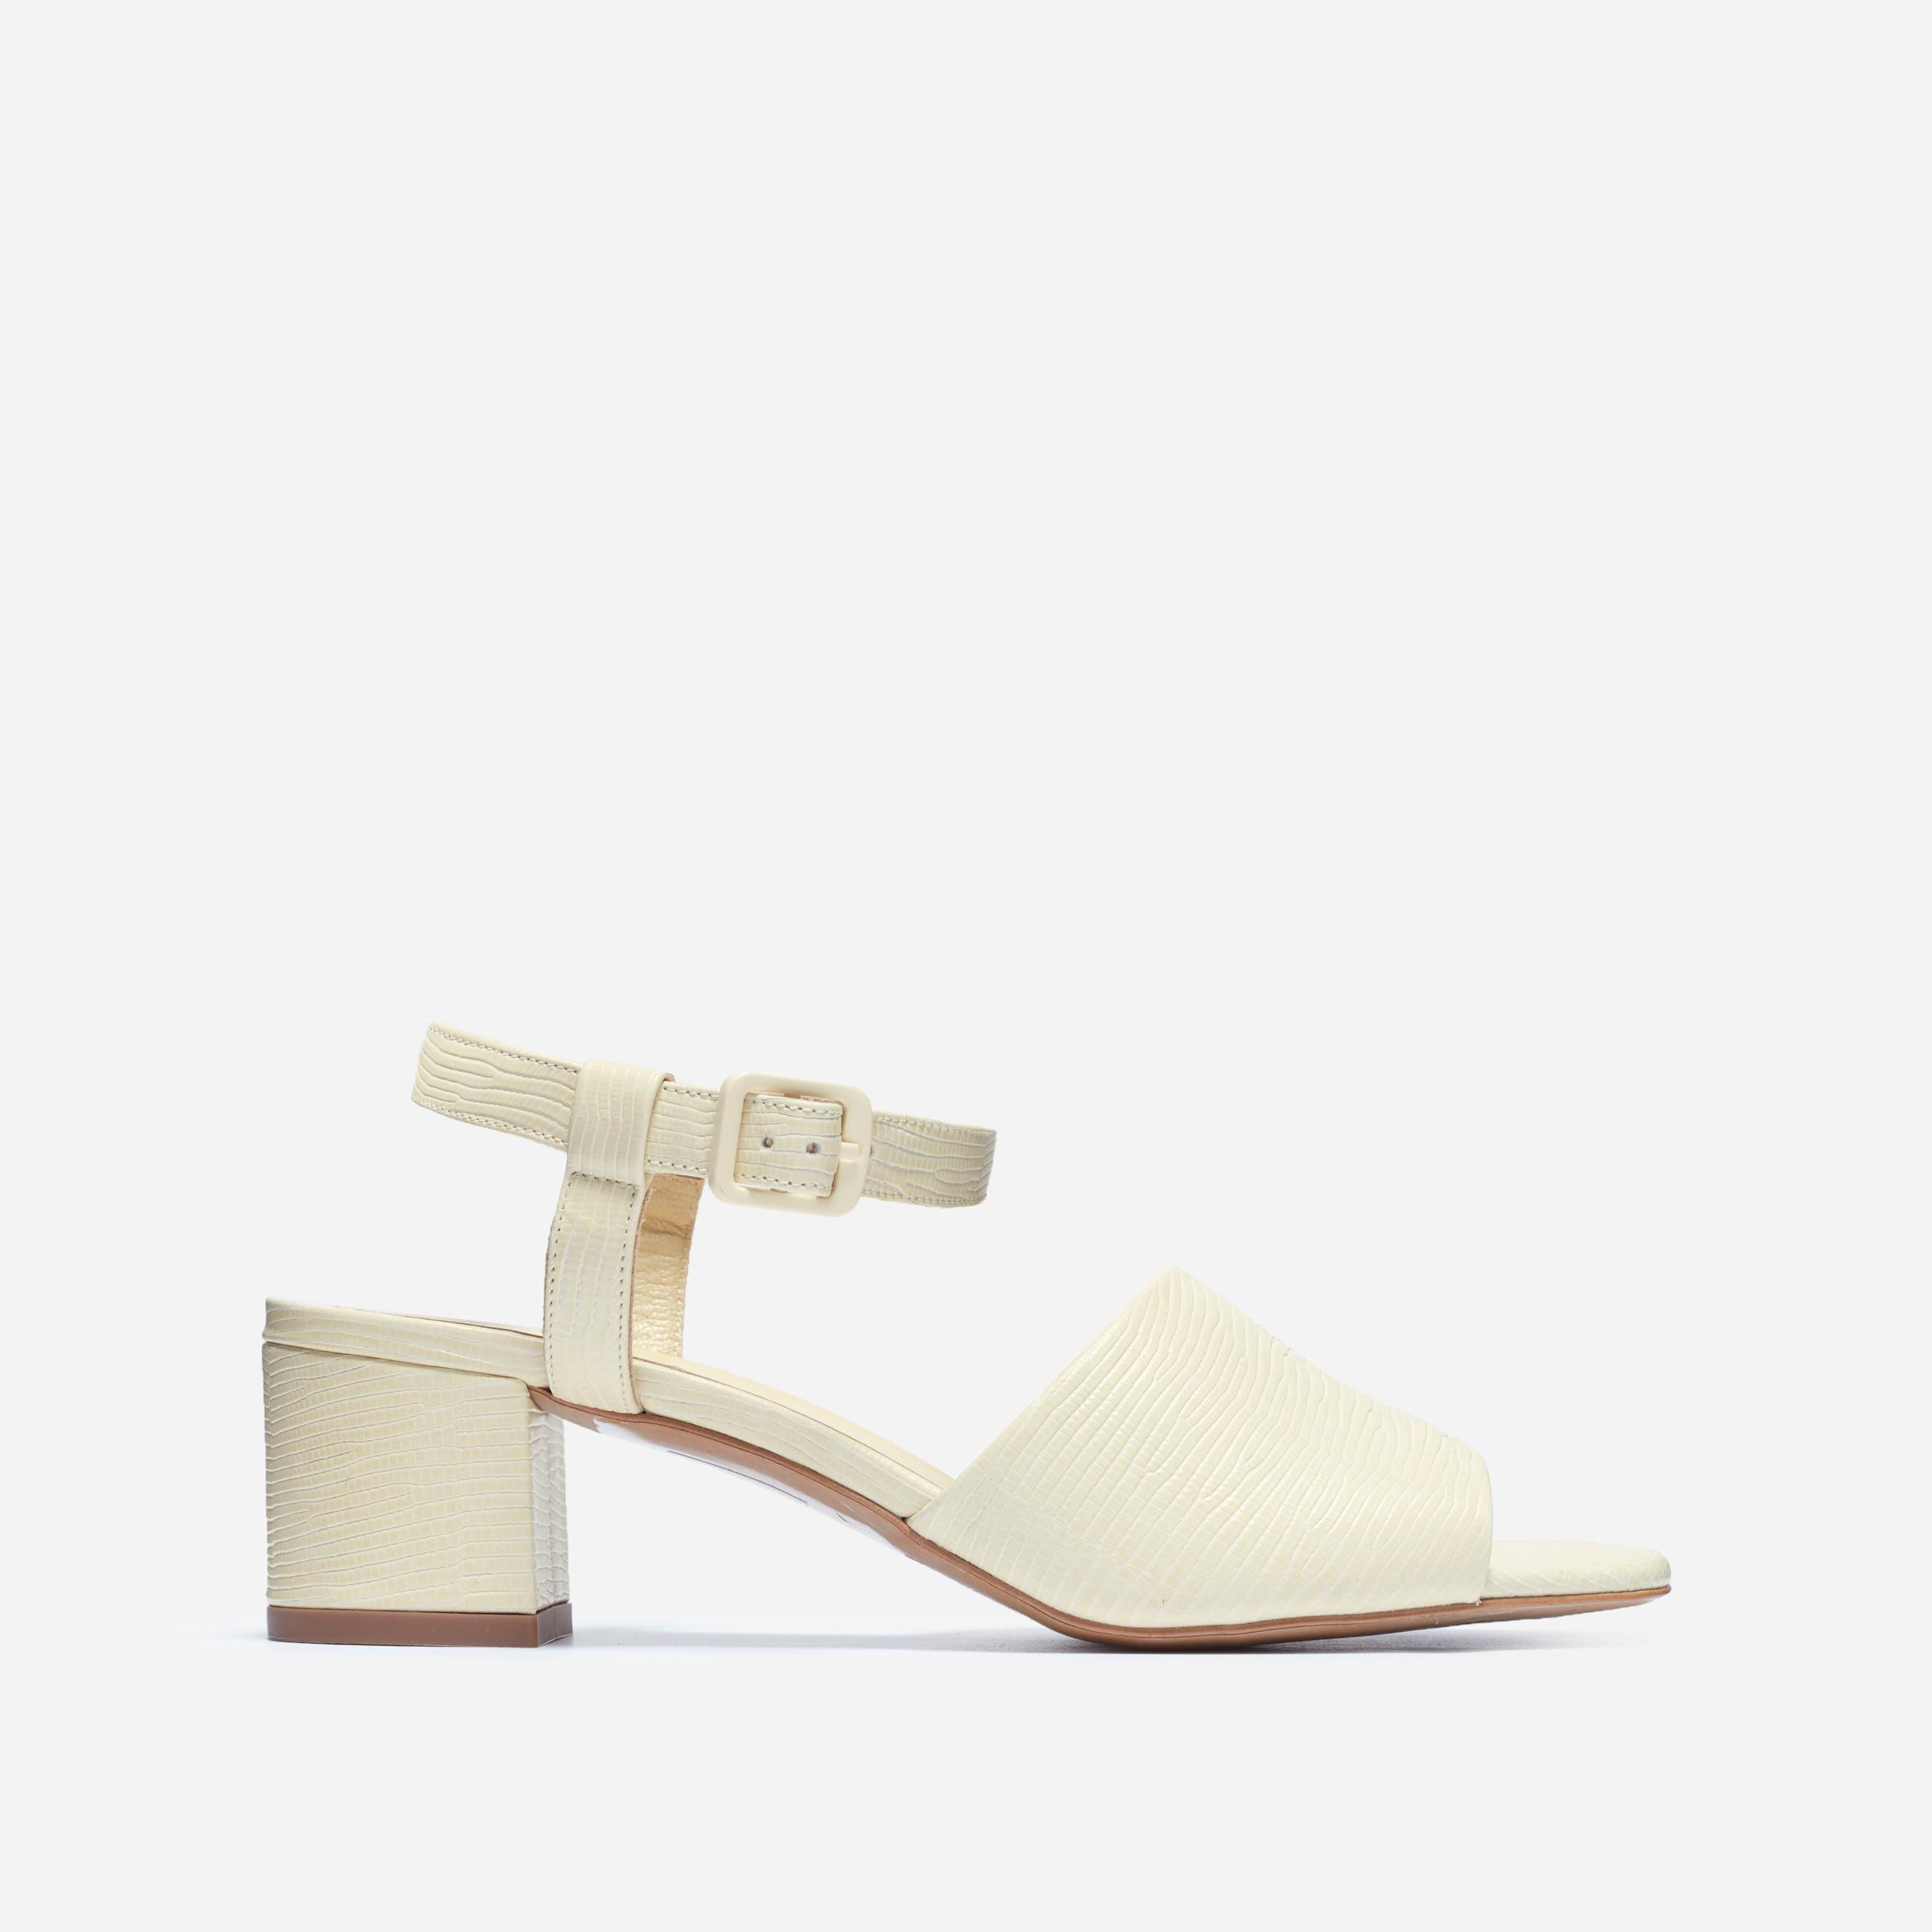 dc31200a35b The Block Heel Sandal —  155